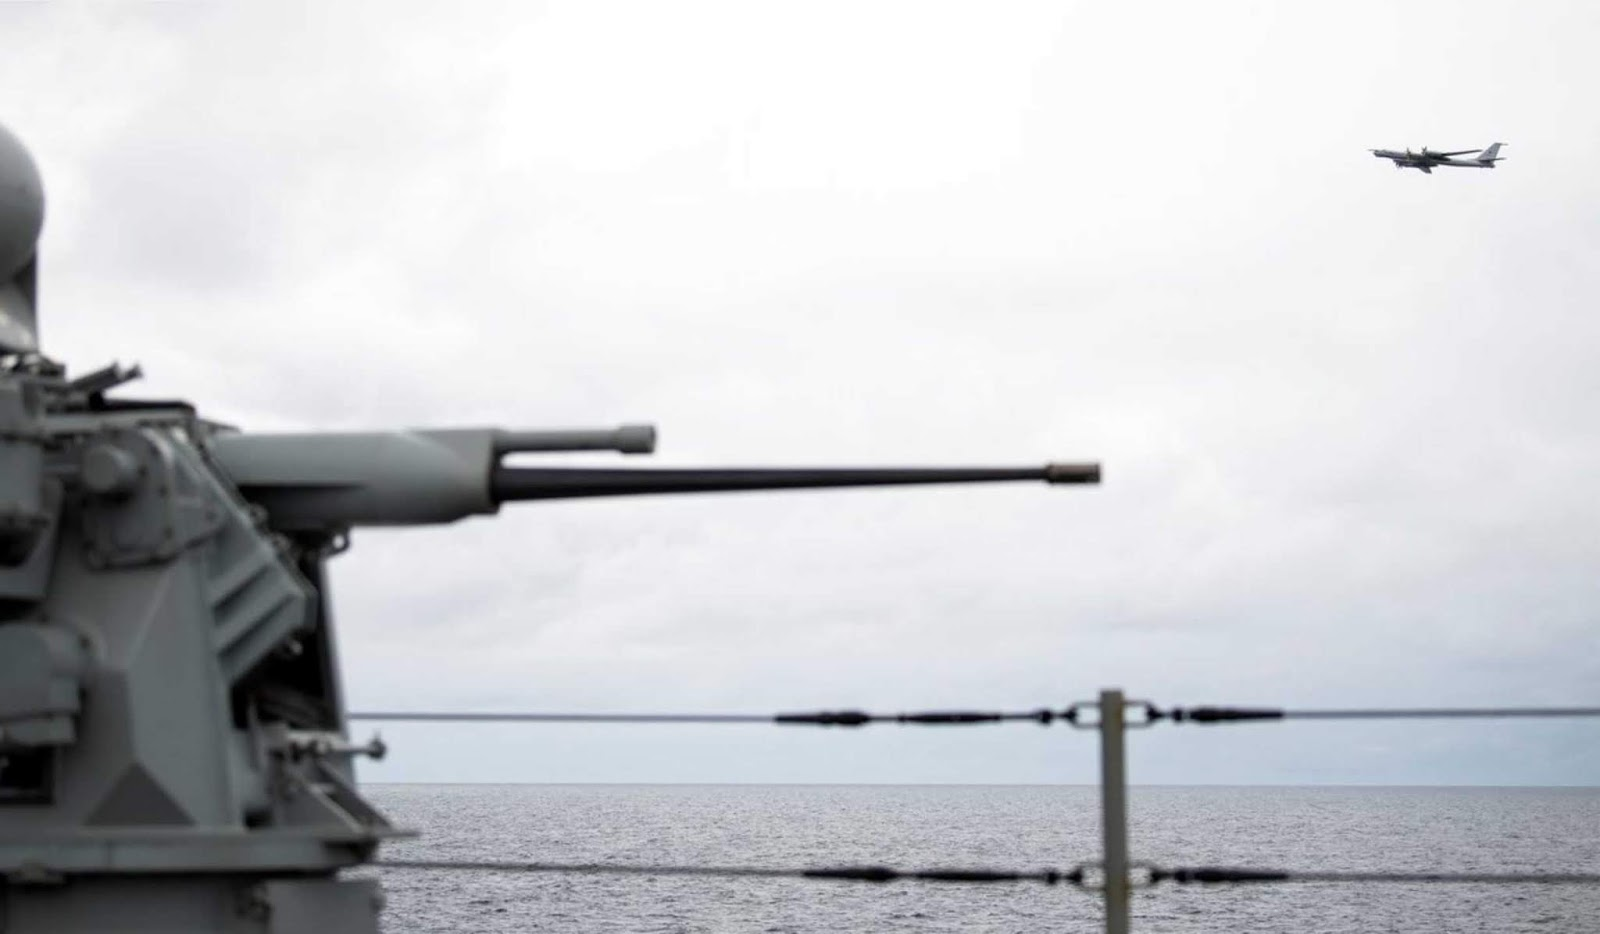 Pesawat Rusia mendekati kapal unggulan Armada Keenam AS dengan ketinggian rendah